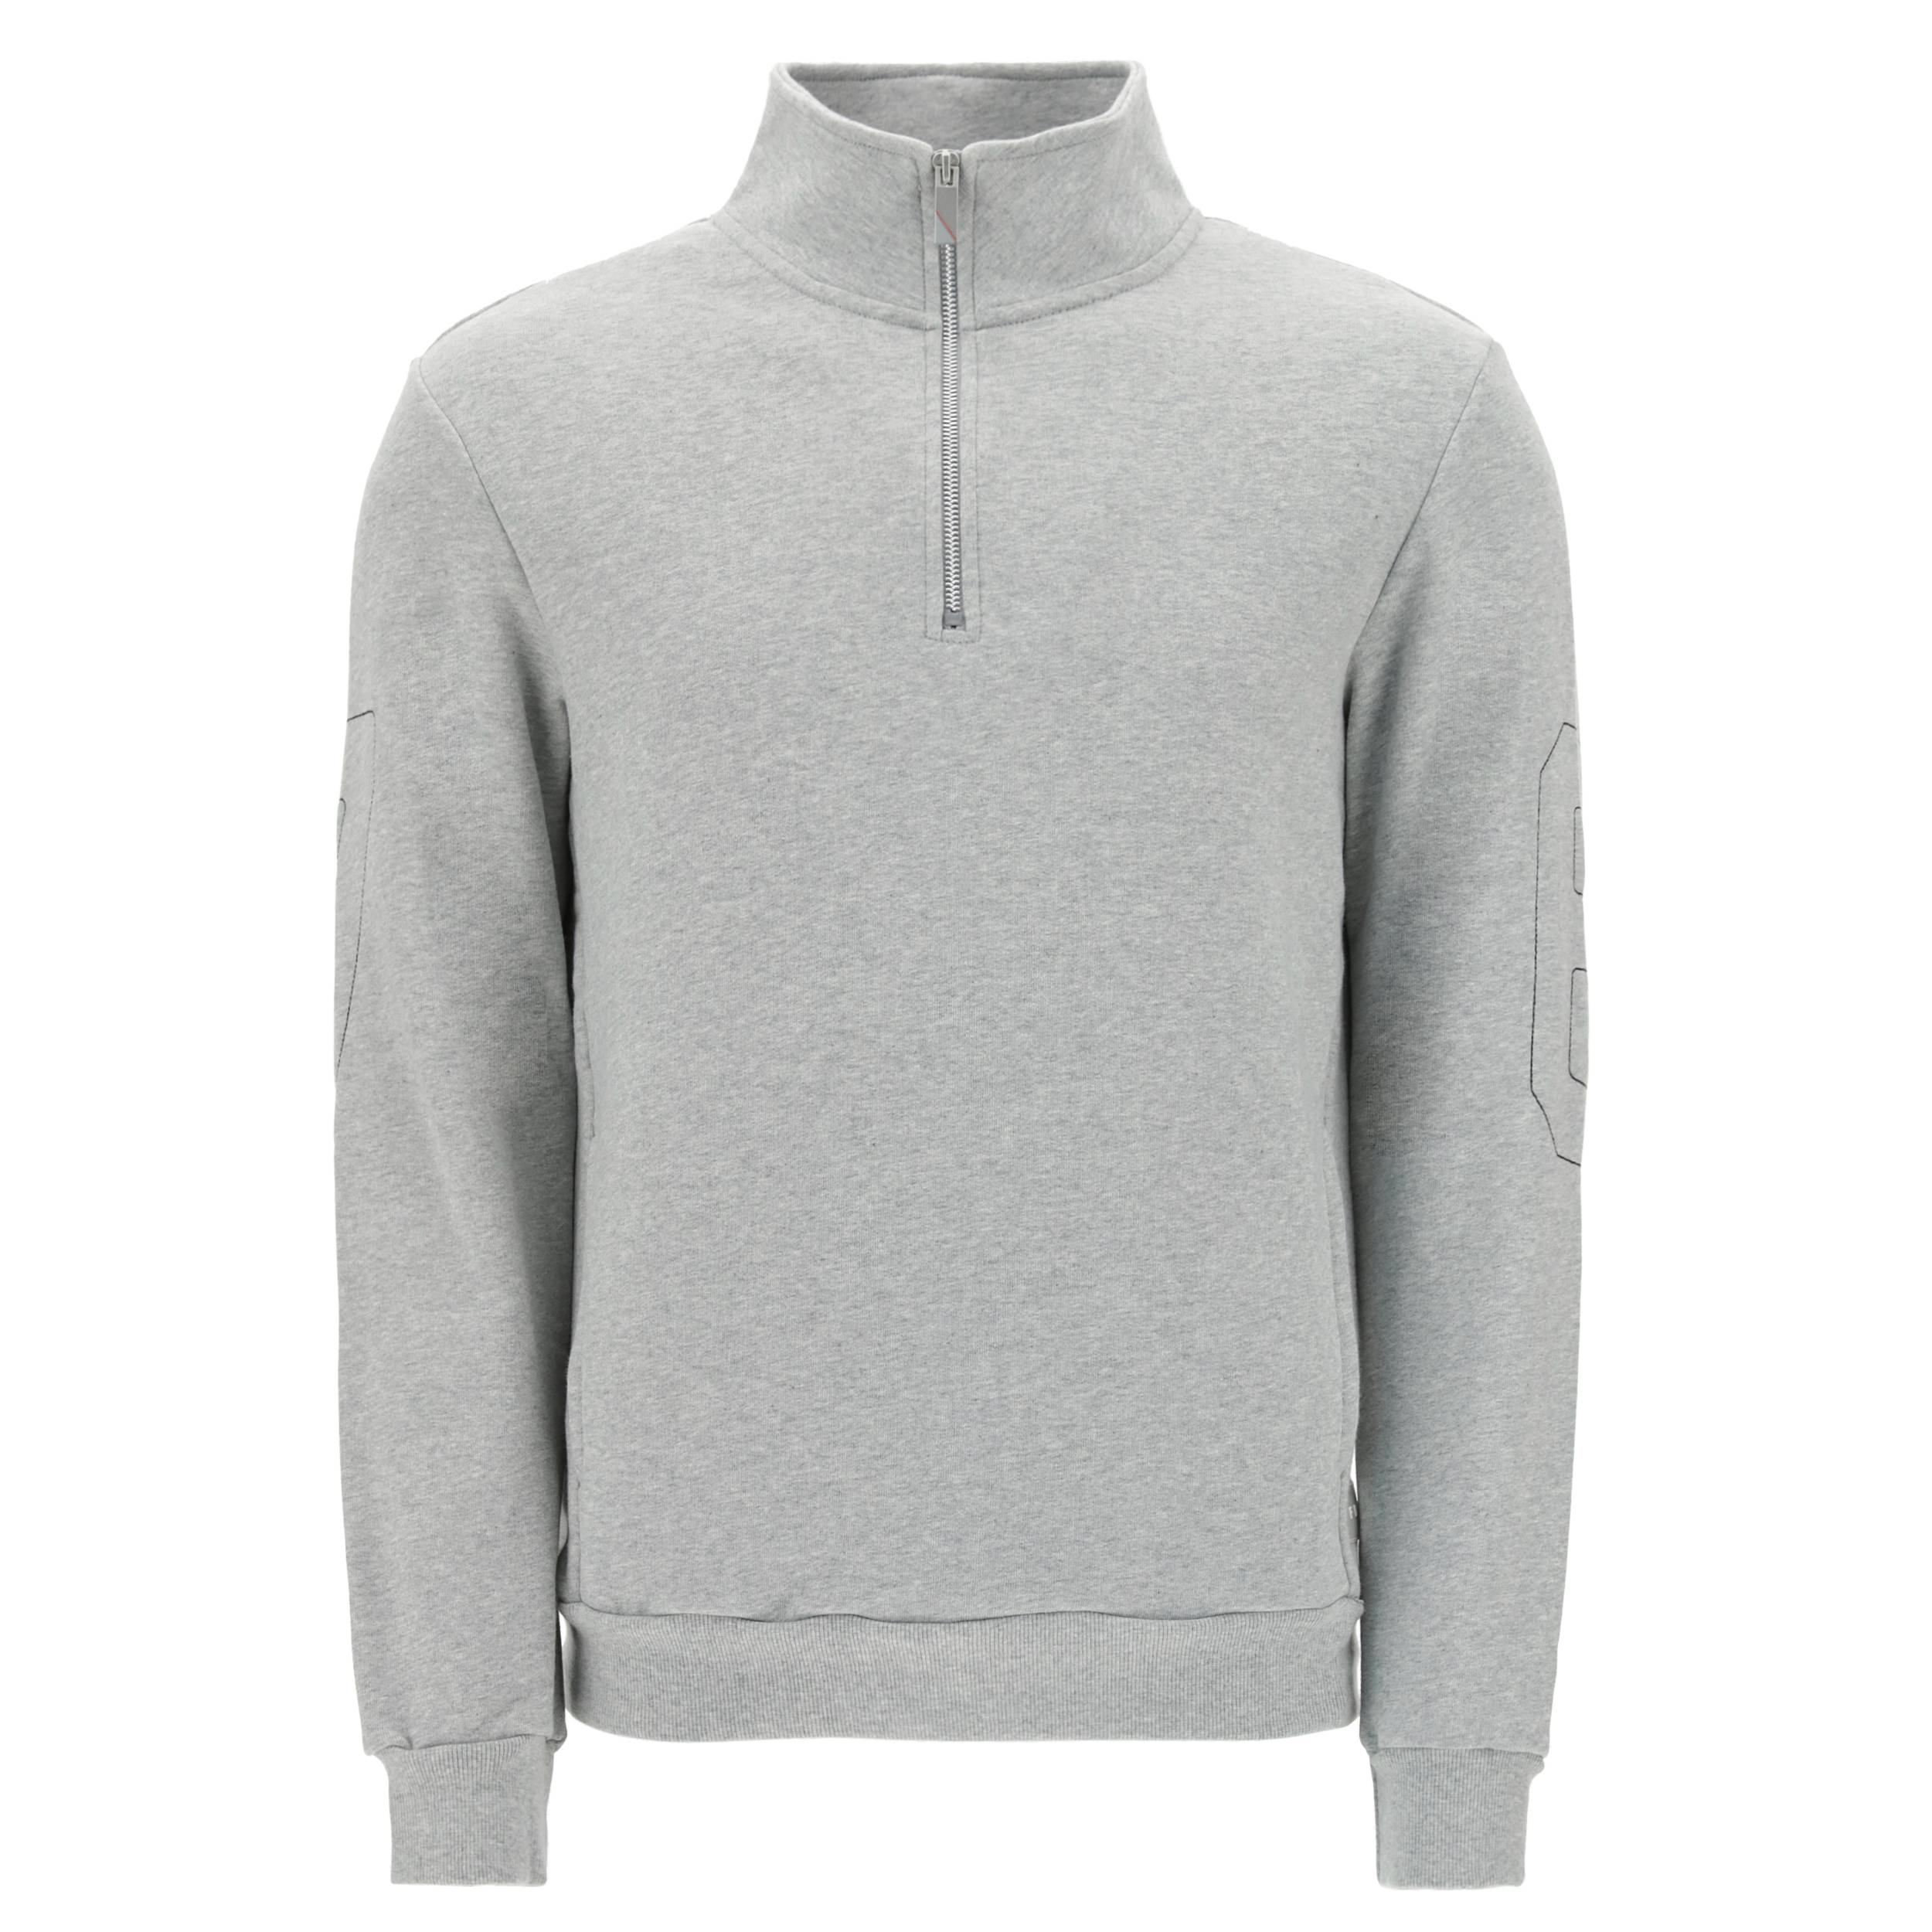 freddy felpa 1/2 zip melange gray